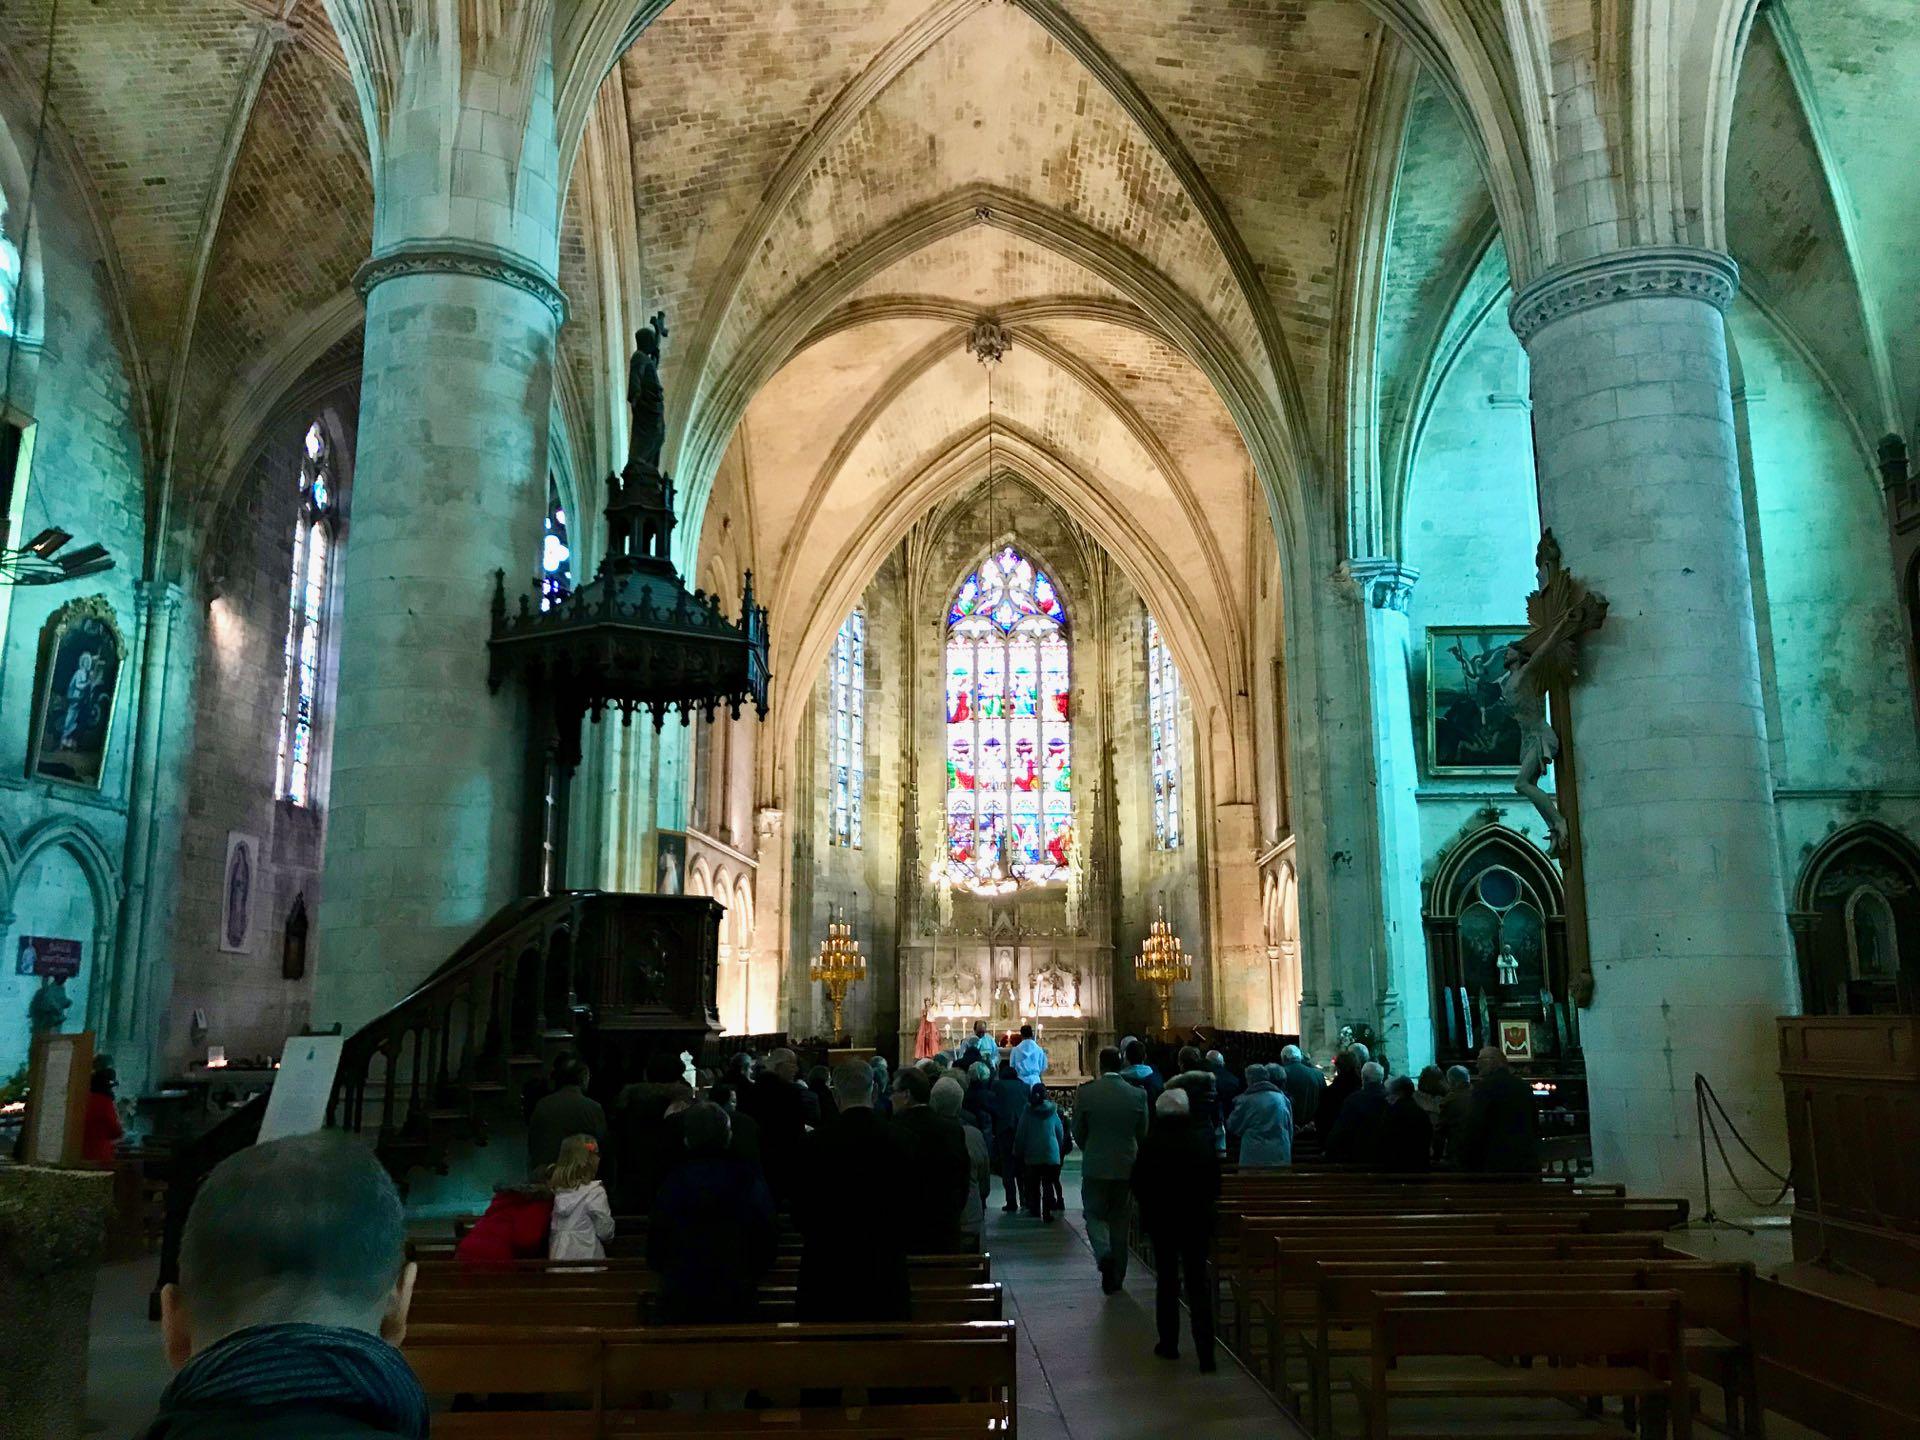 EREN Meeting 11-2017 in Bordeaux, France  - 8.jpg